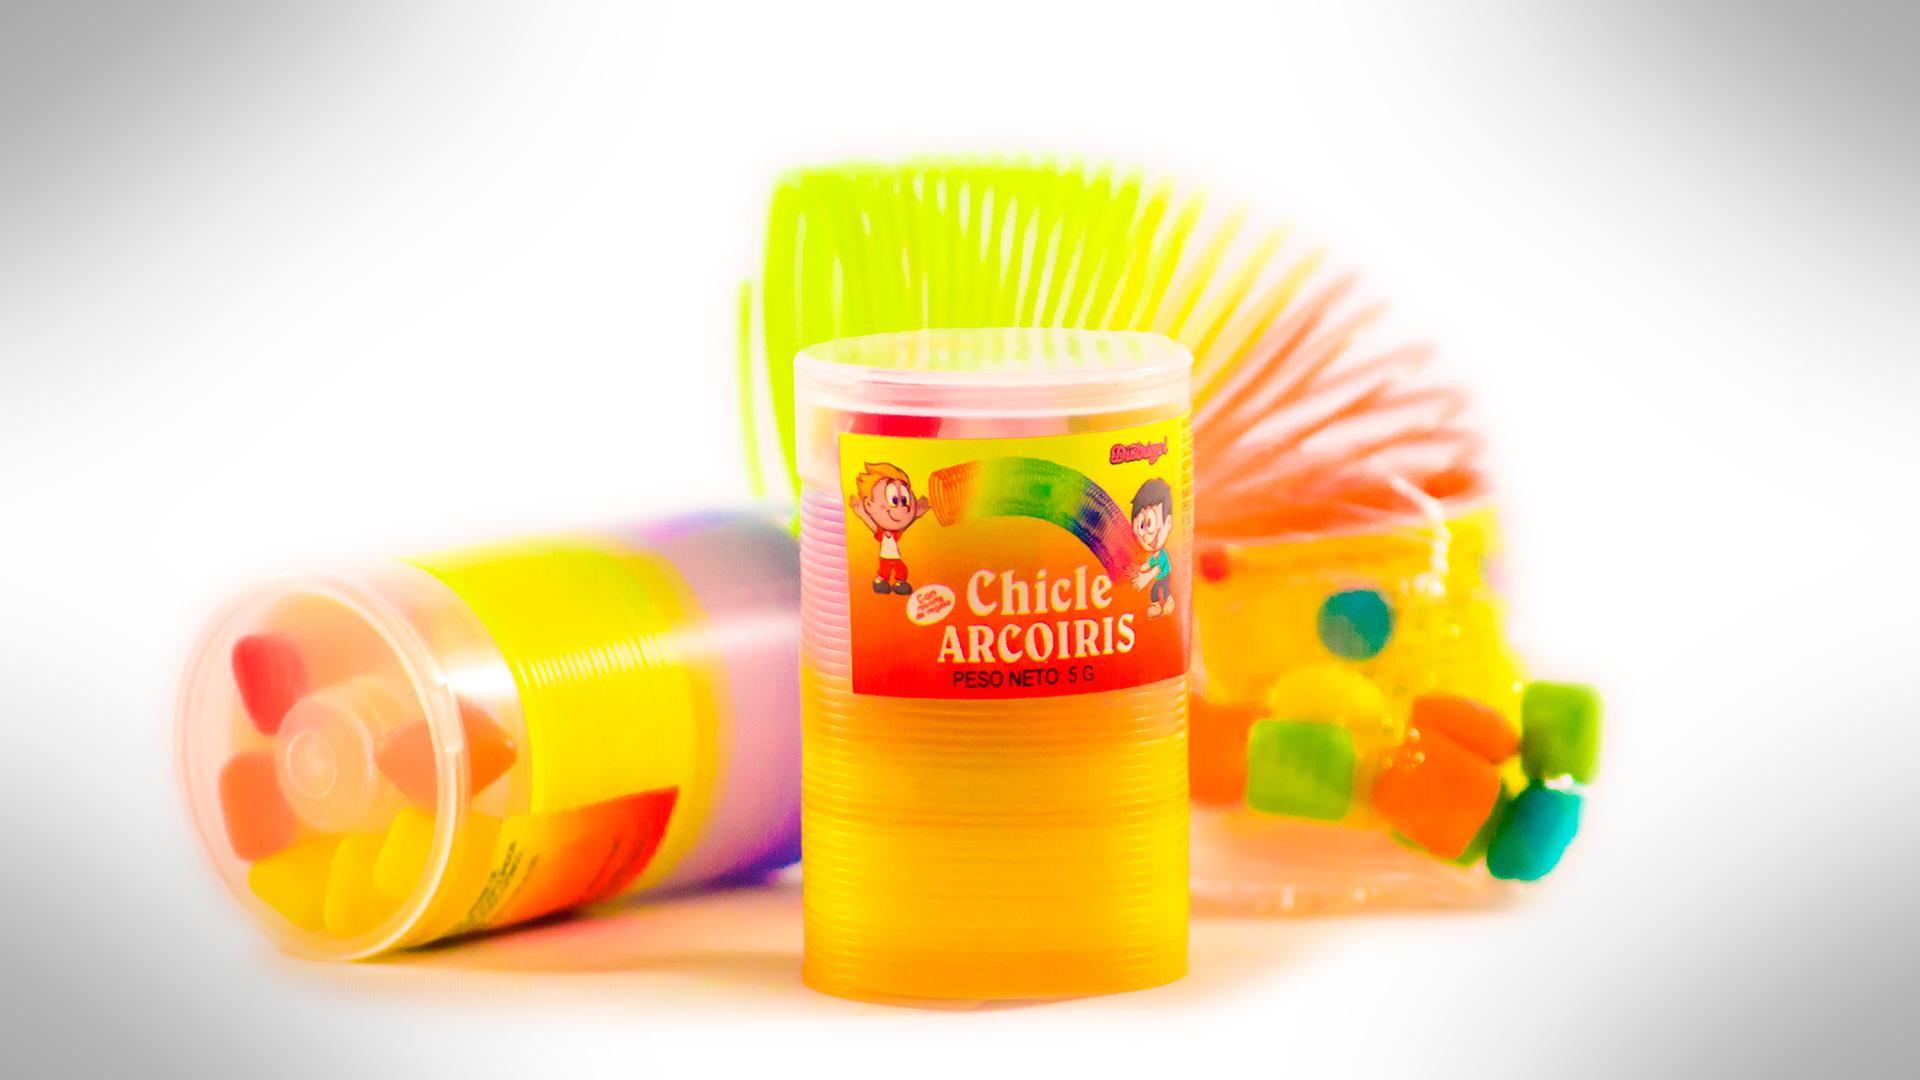 Chicle Arcoiris